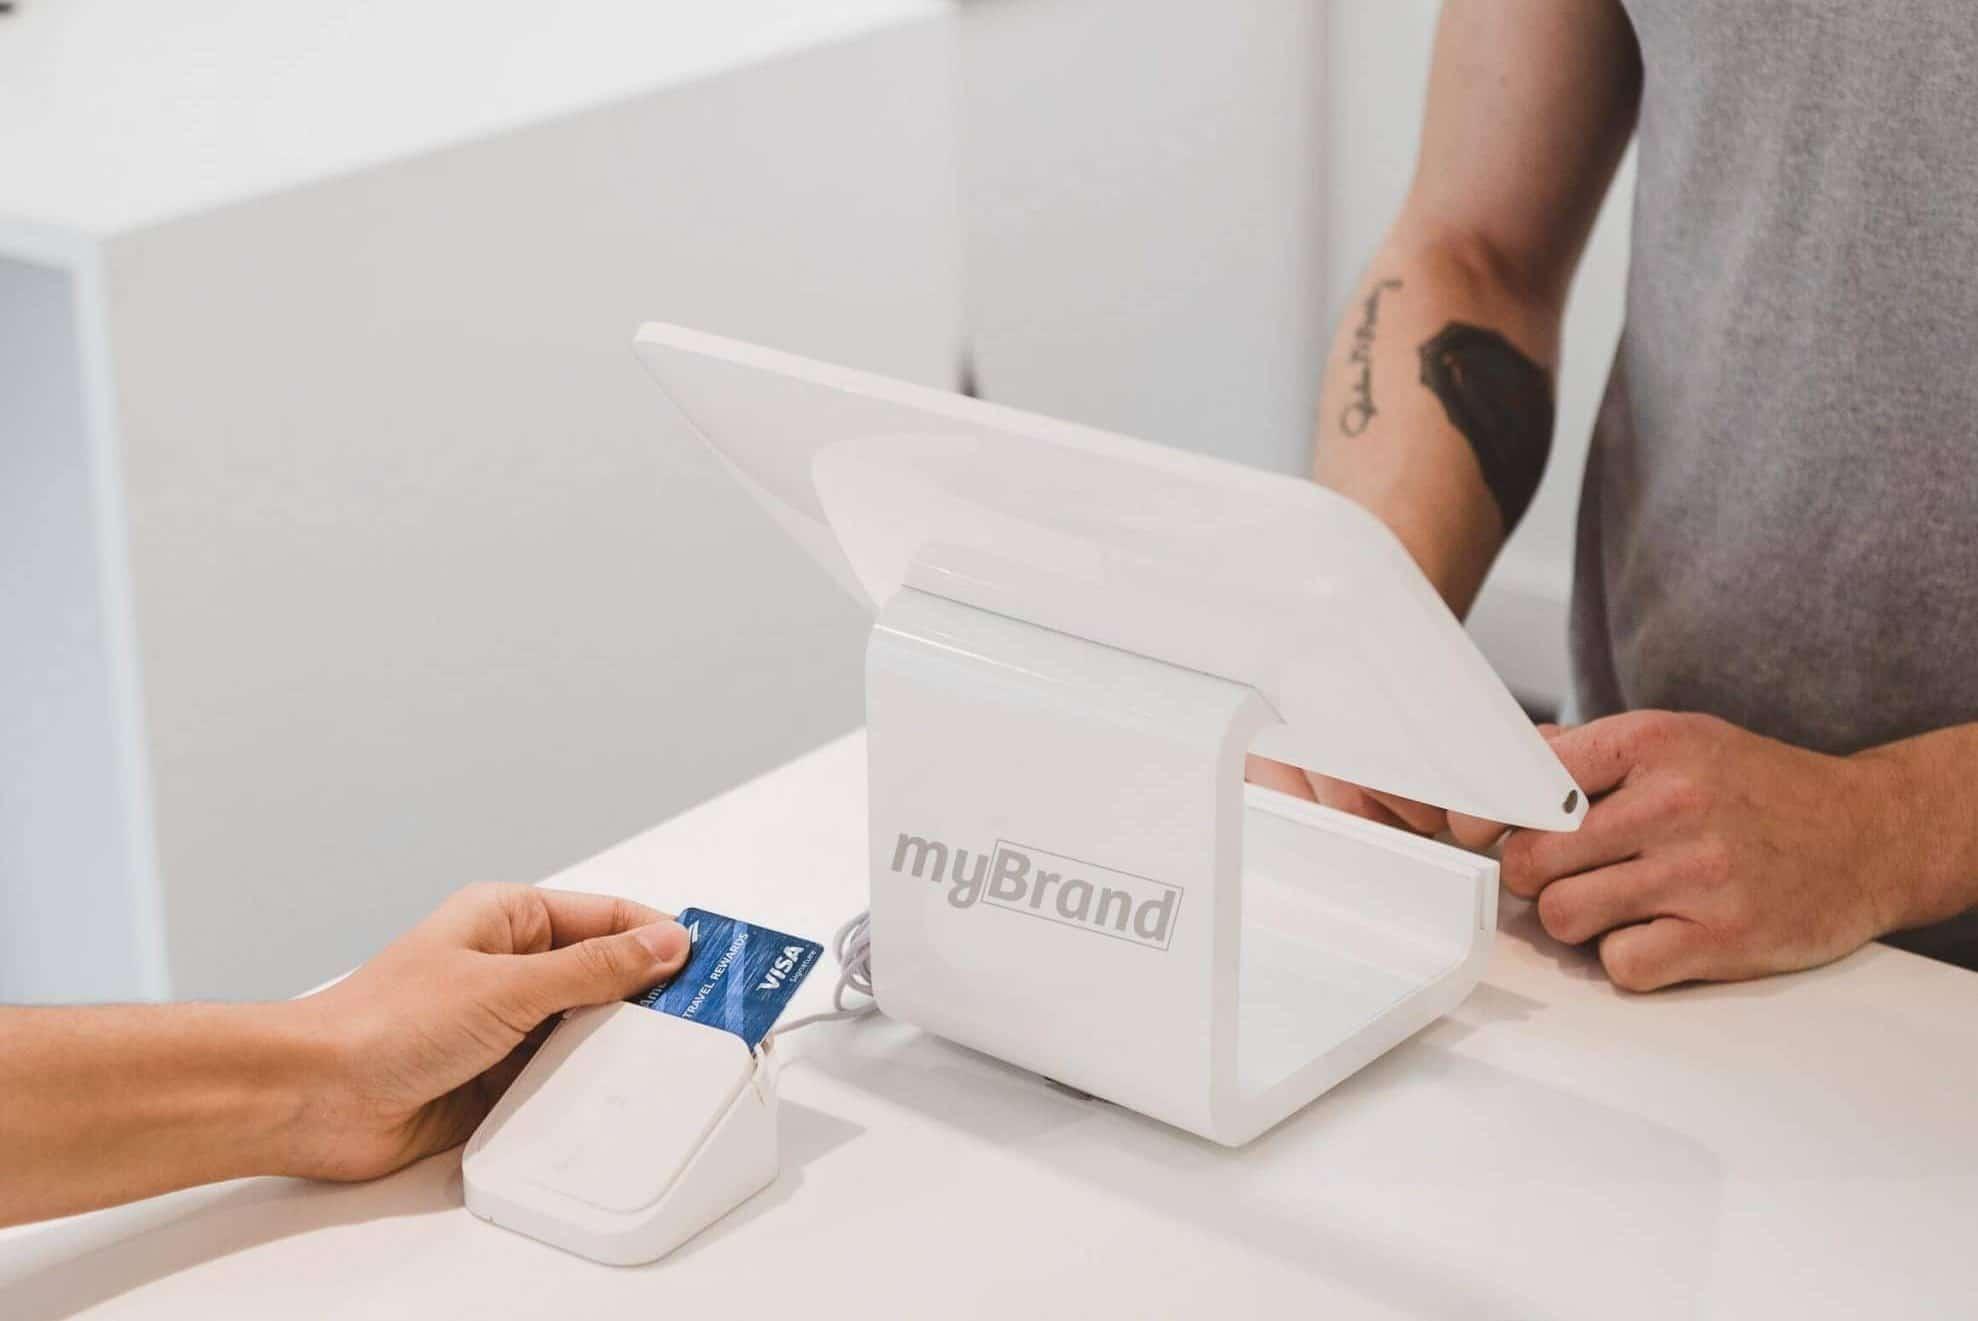 myBrand point of sale